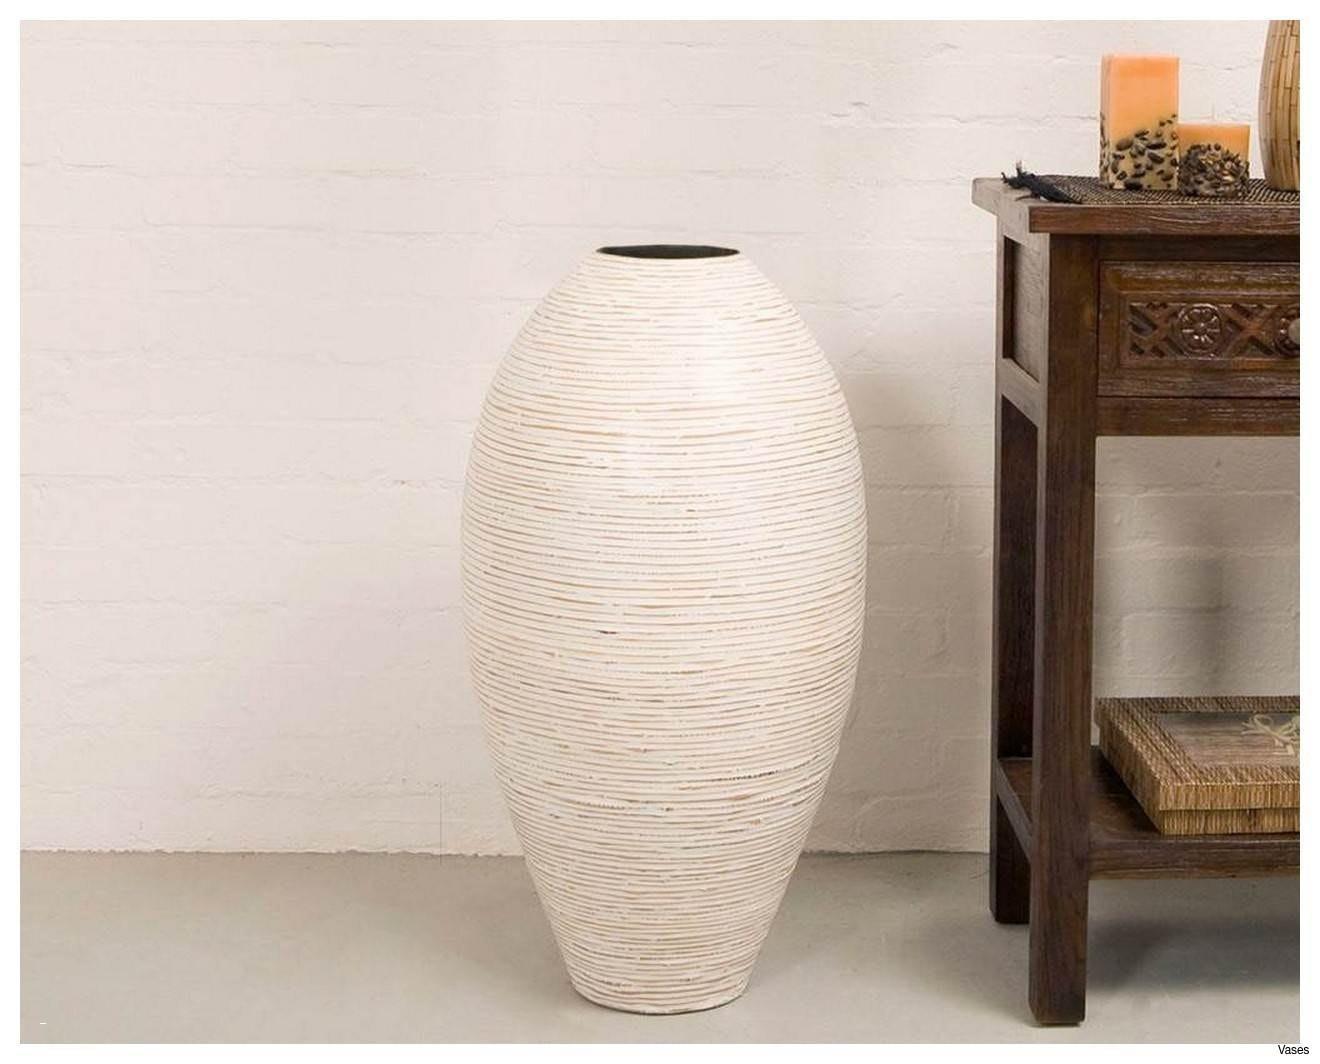 ceramic wall vase of standing lamps ikea elegant pe s5h vases floor ikea i 0d tall inside standing lamps ikea elegant pe s5h vases floor ikea i 0d tall michaels scheme ikea decor